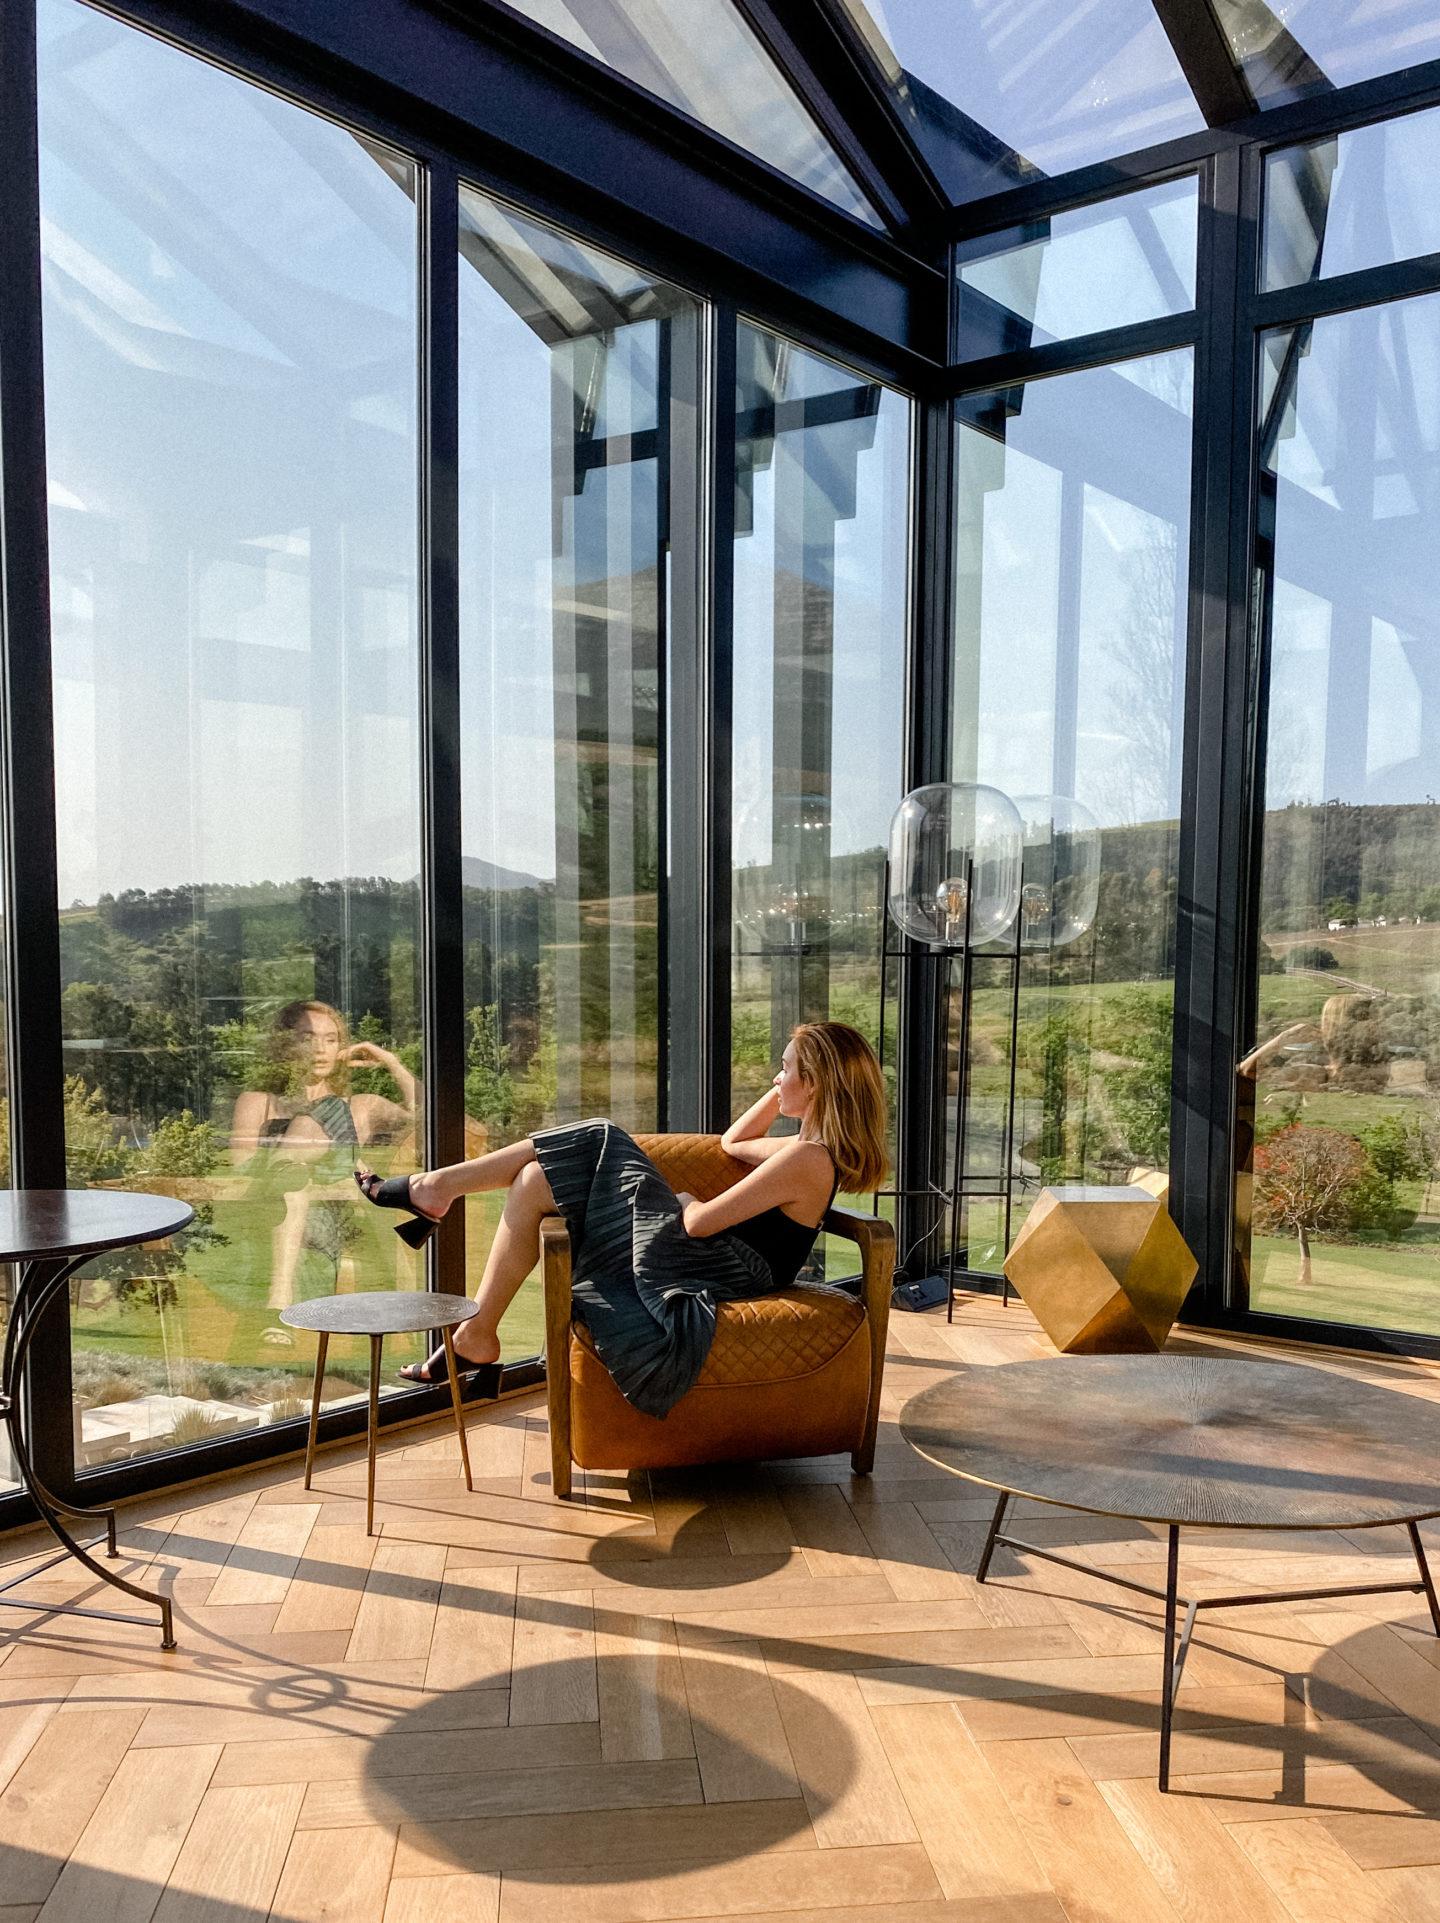 A Weekend in Stellenbosch